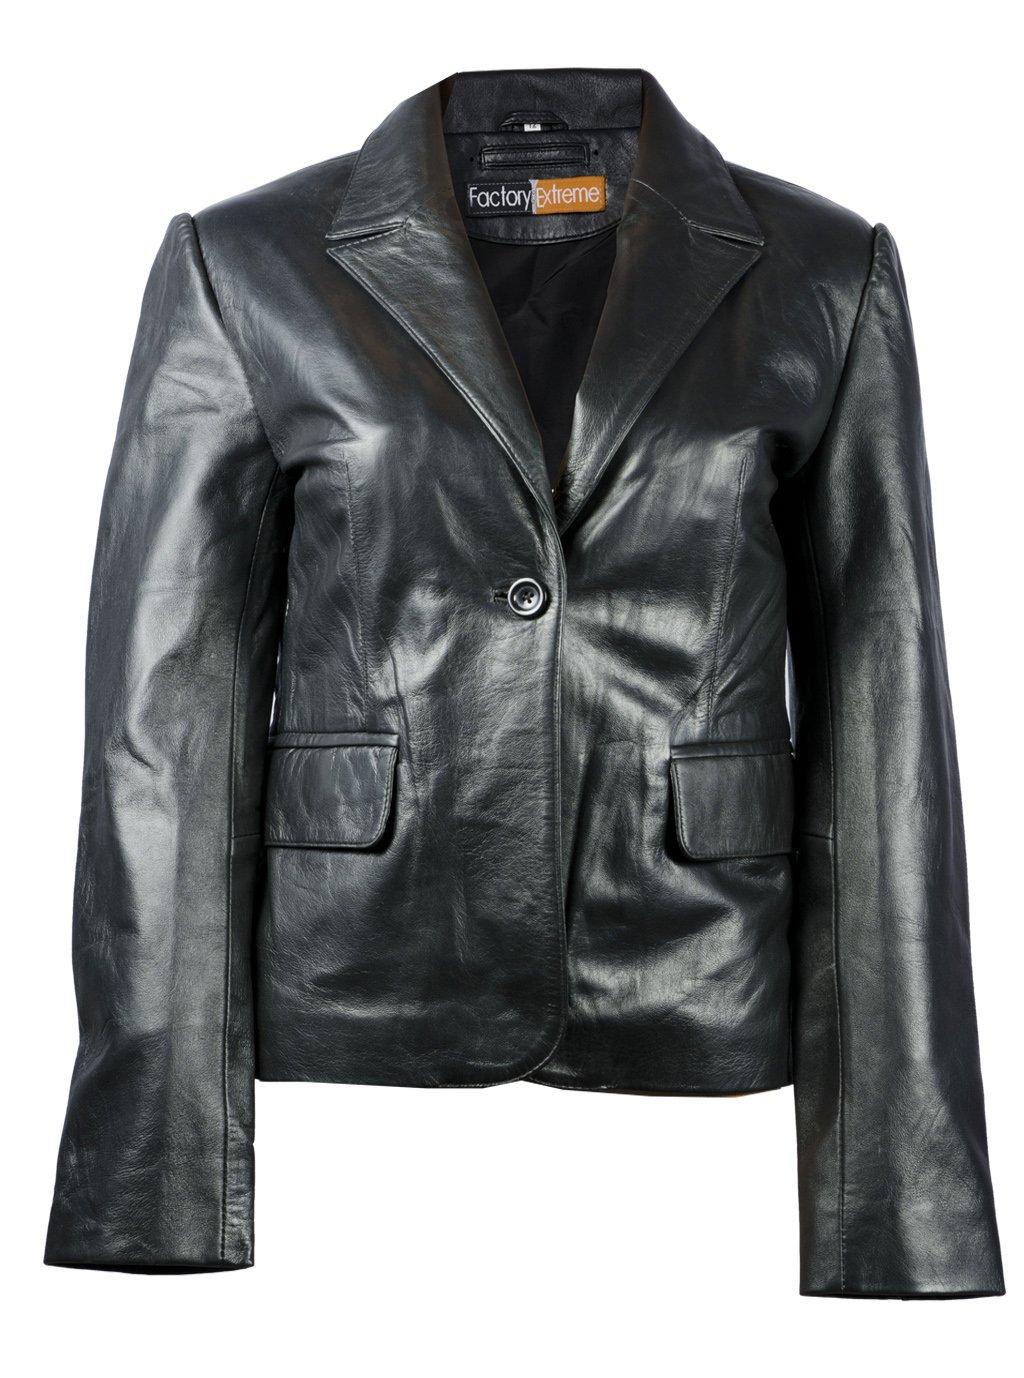 FactoryExtreme Four Seasons Classic Womens Black Leather Blazer, XXX-Large, Black